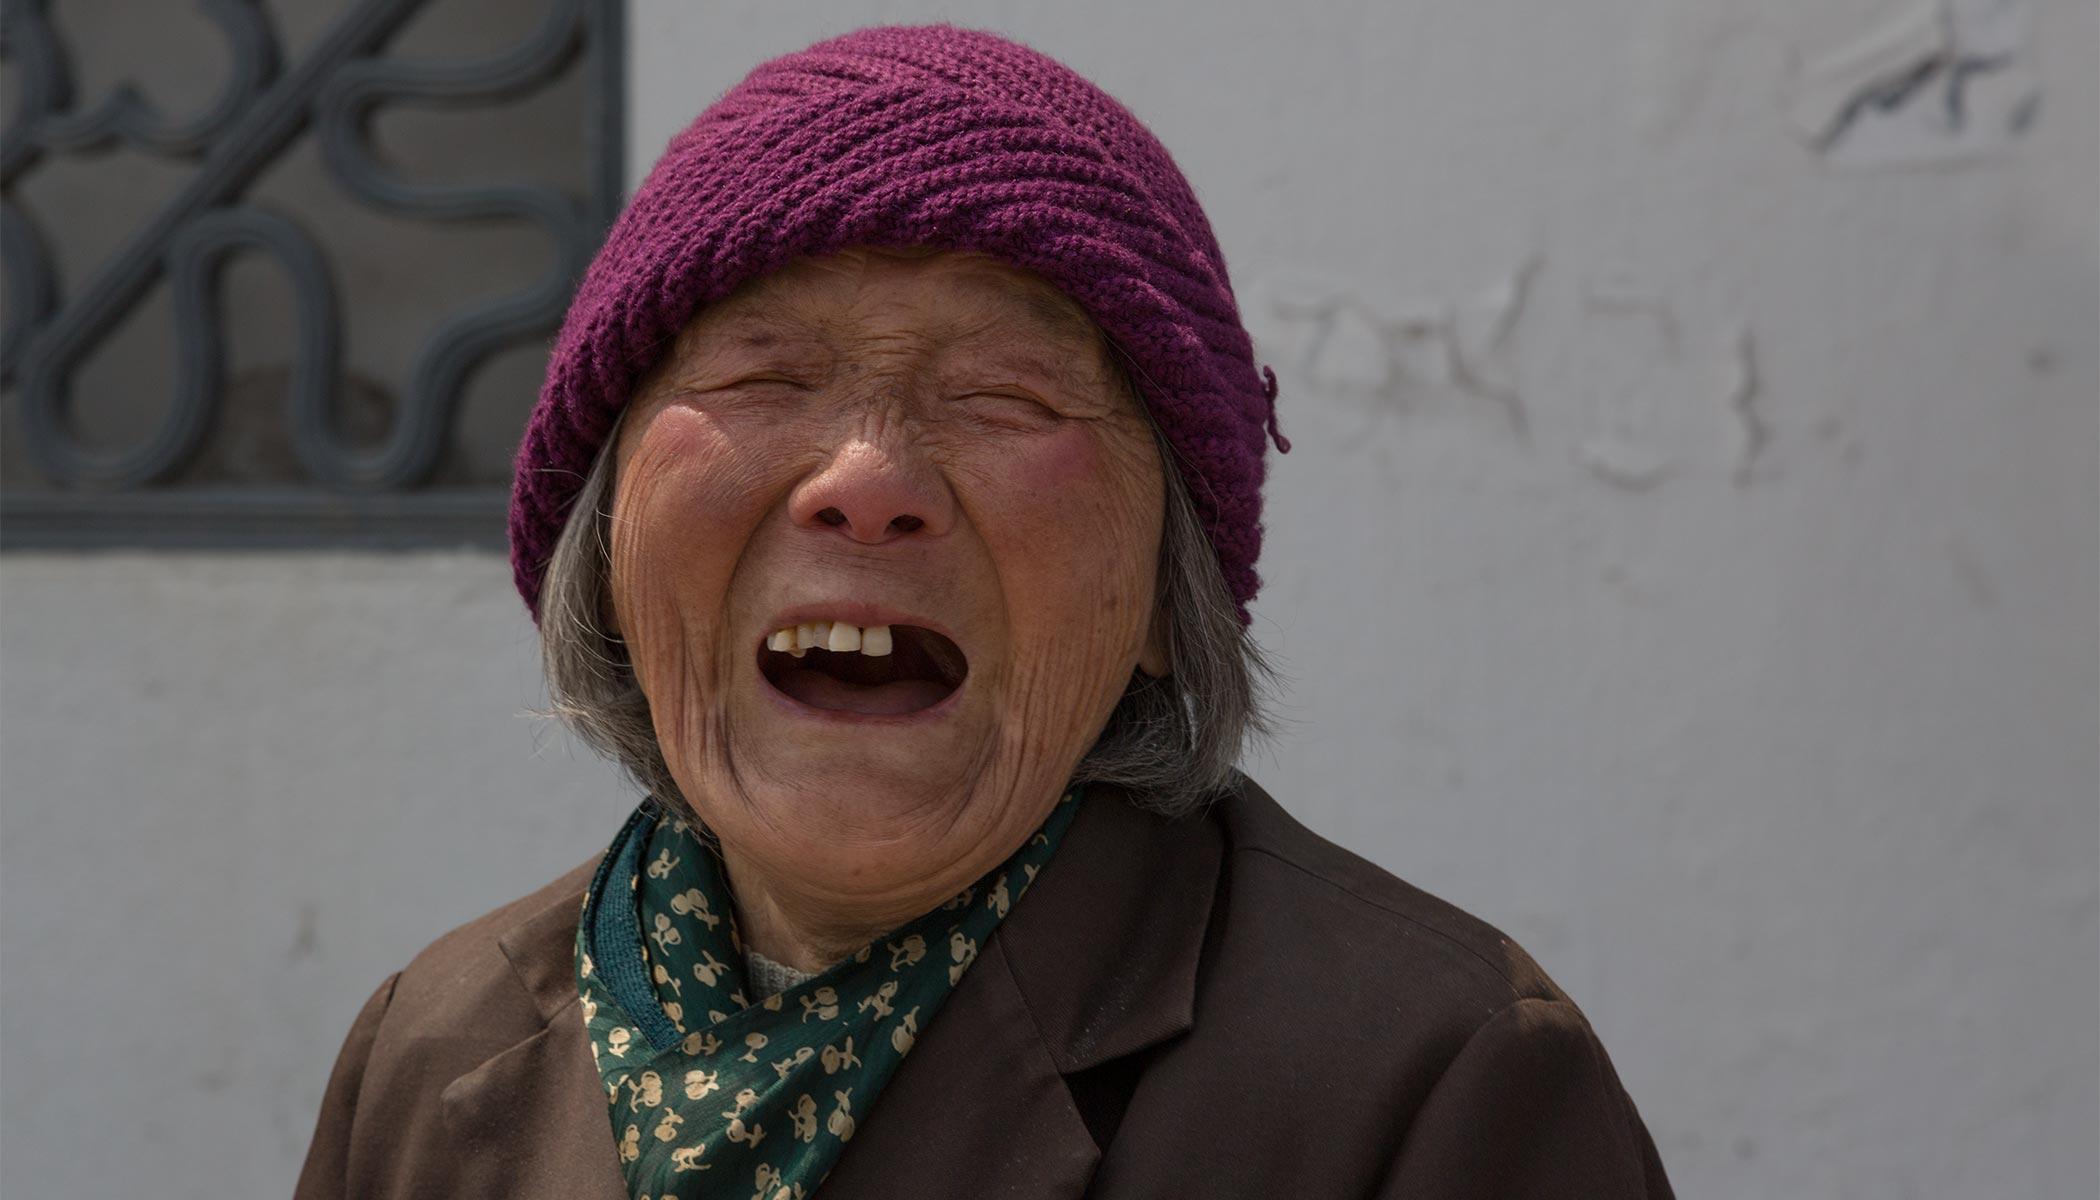 Faces-of-joy-china